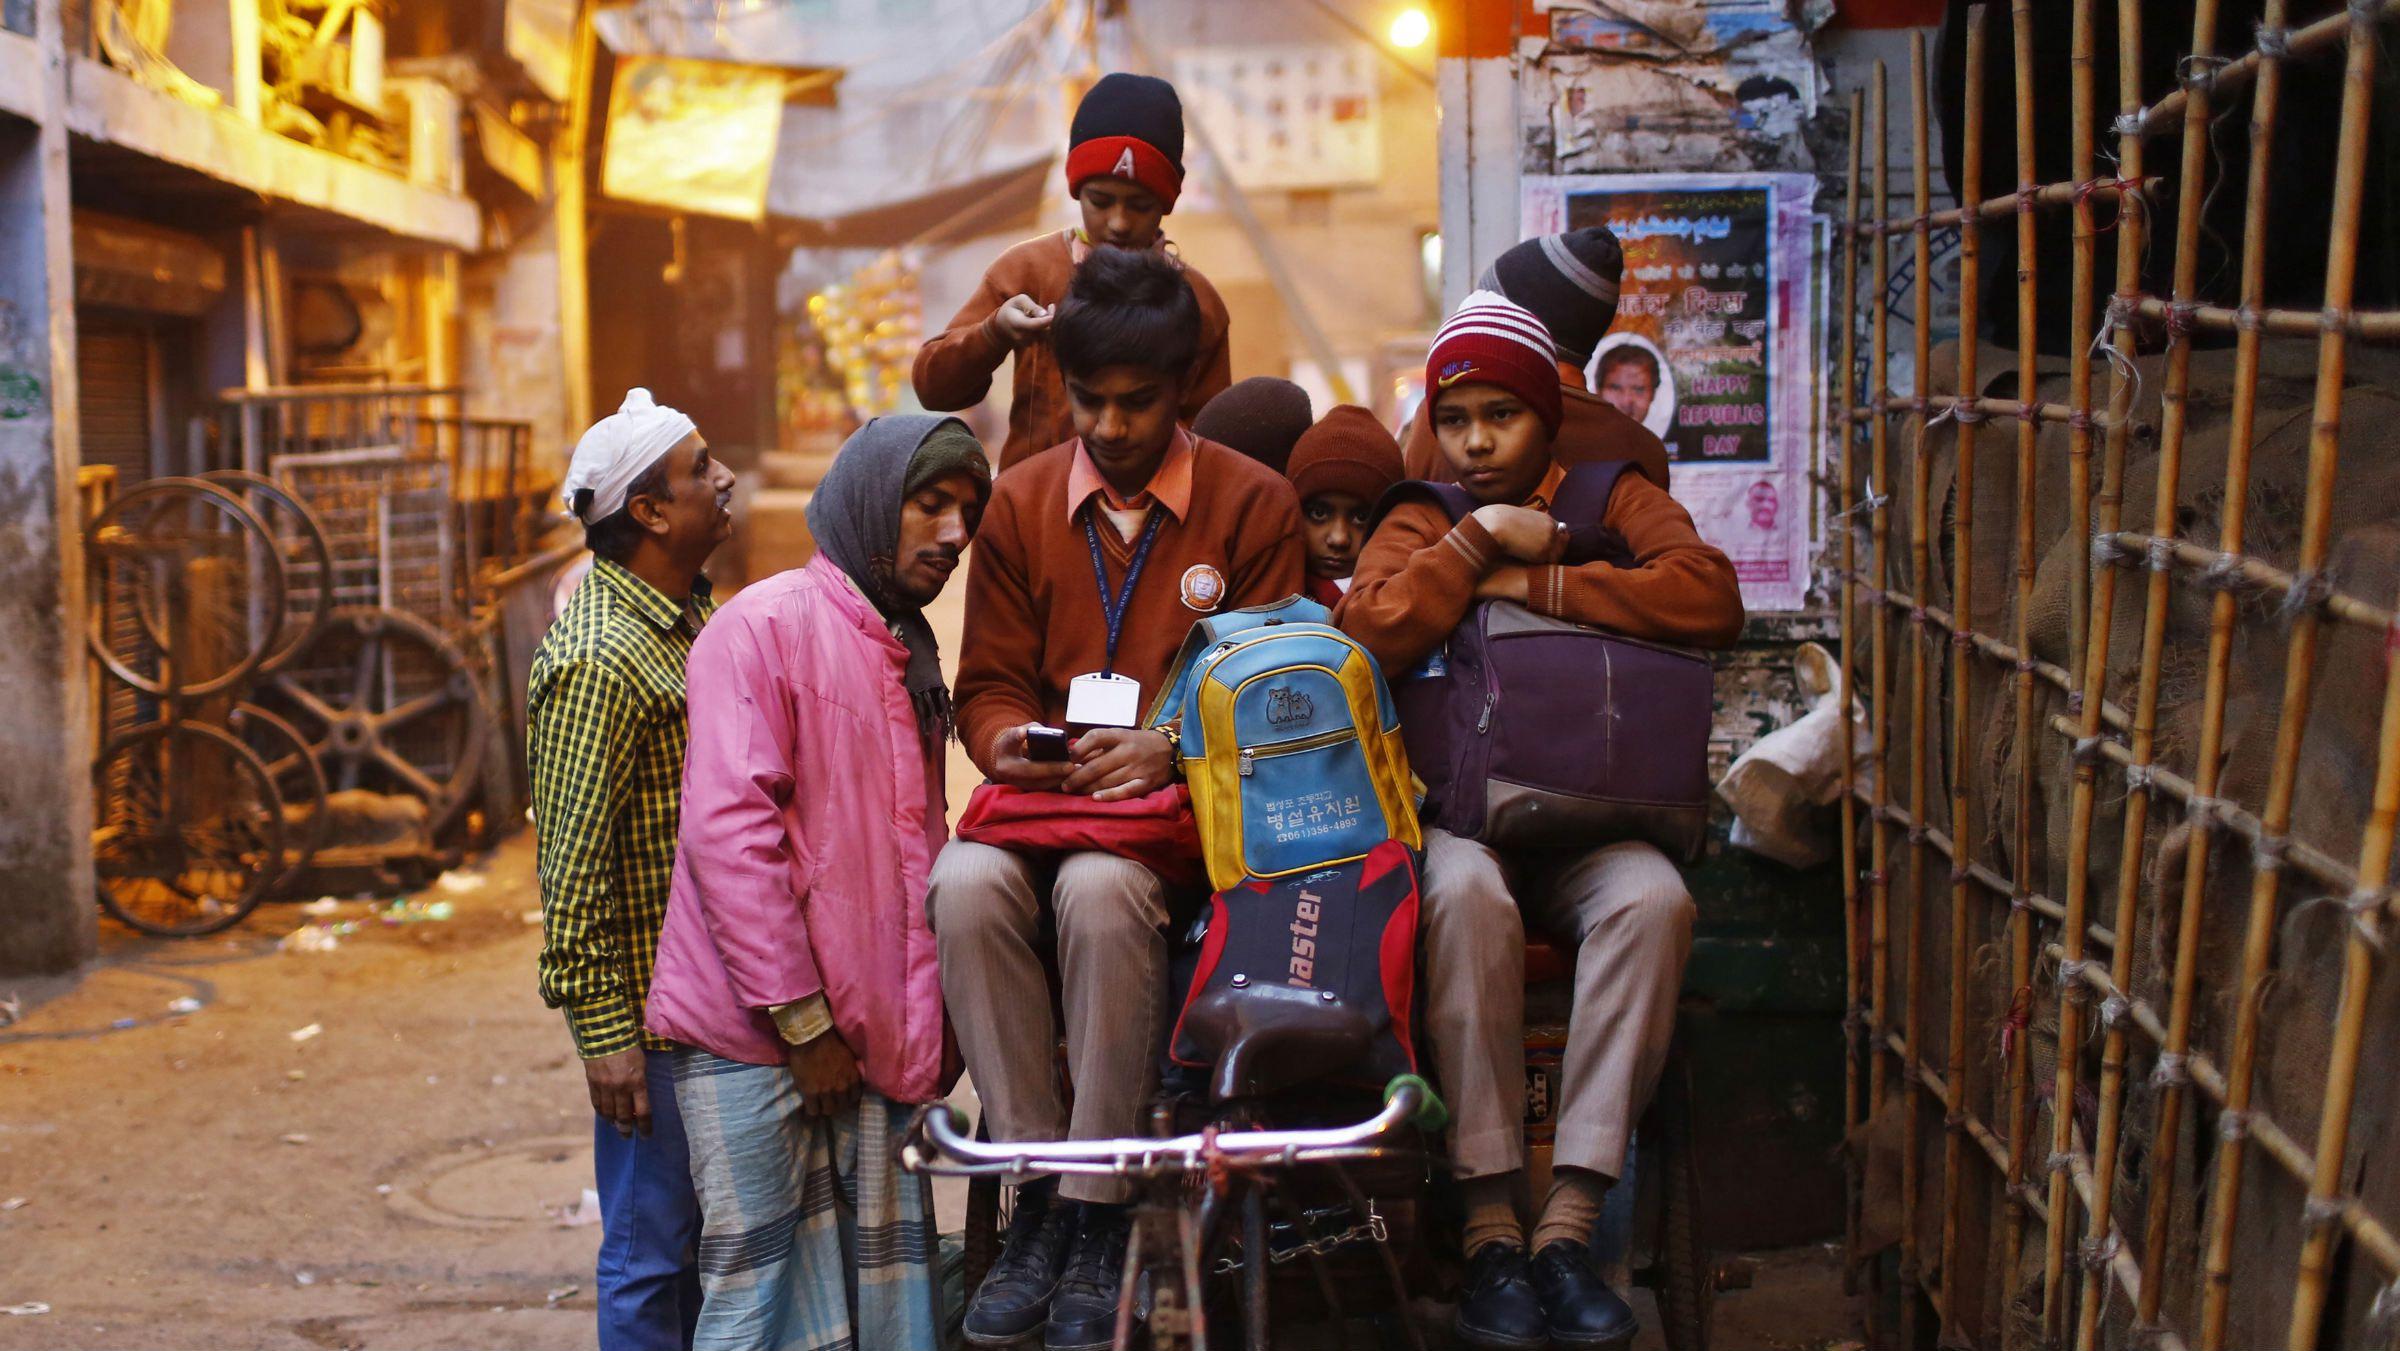 india-school-children-mobile